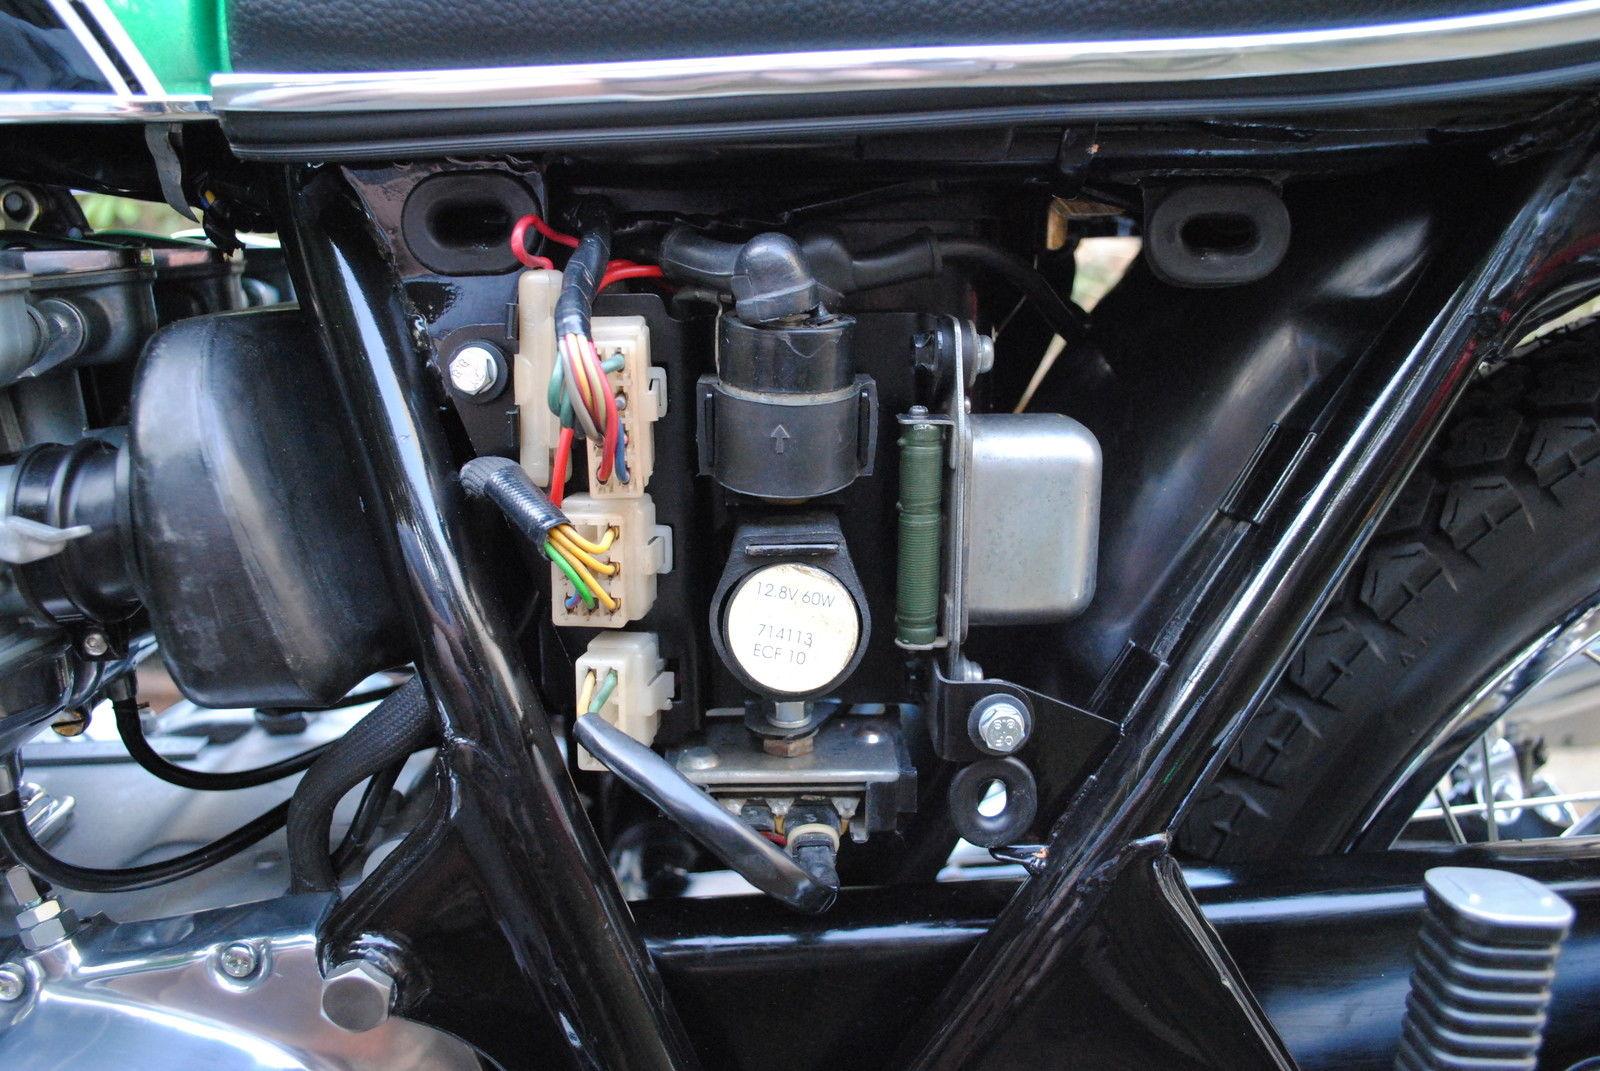 Triumph T120 Wiring Diagram Restored Honda Cb500 Four 1972 Photographs At Classic